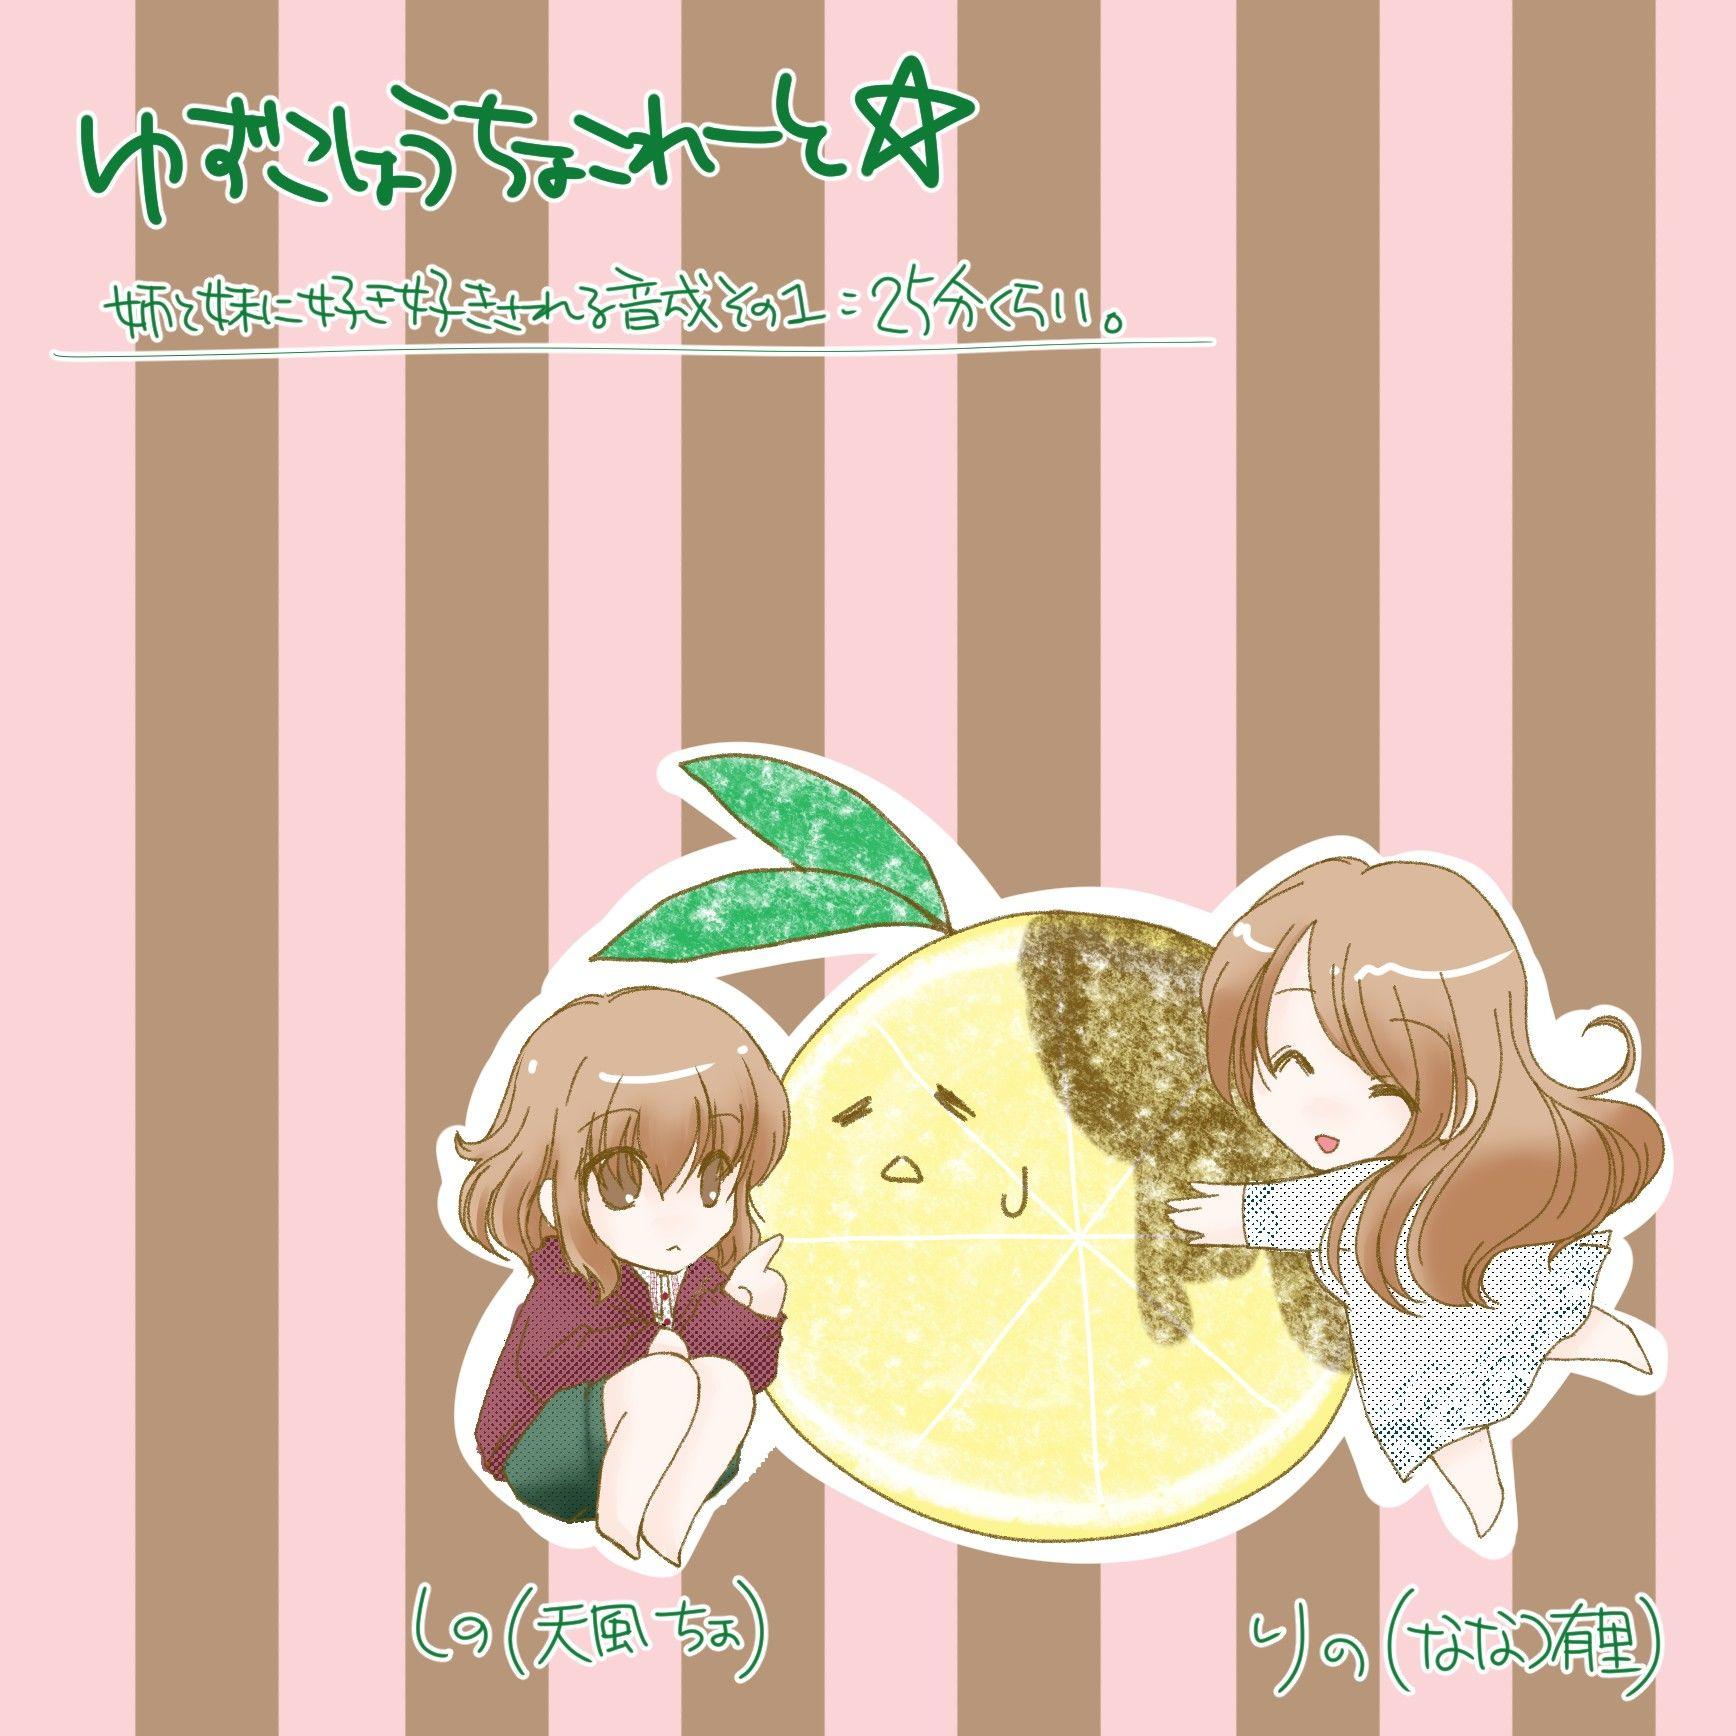 [美乳]「【S-cute】Sayaka #1」(S-cute)